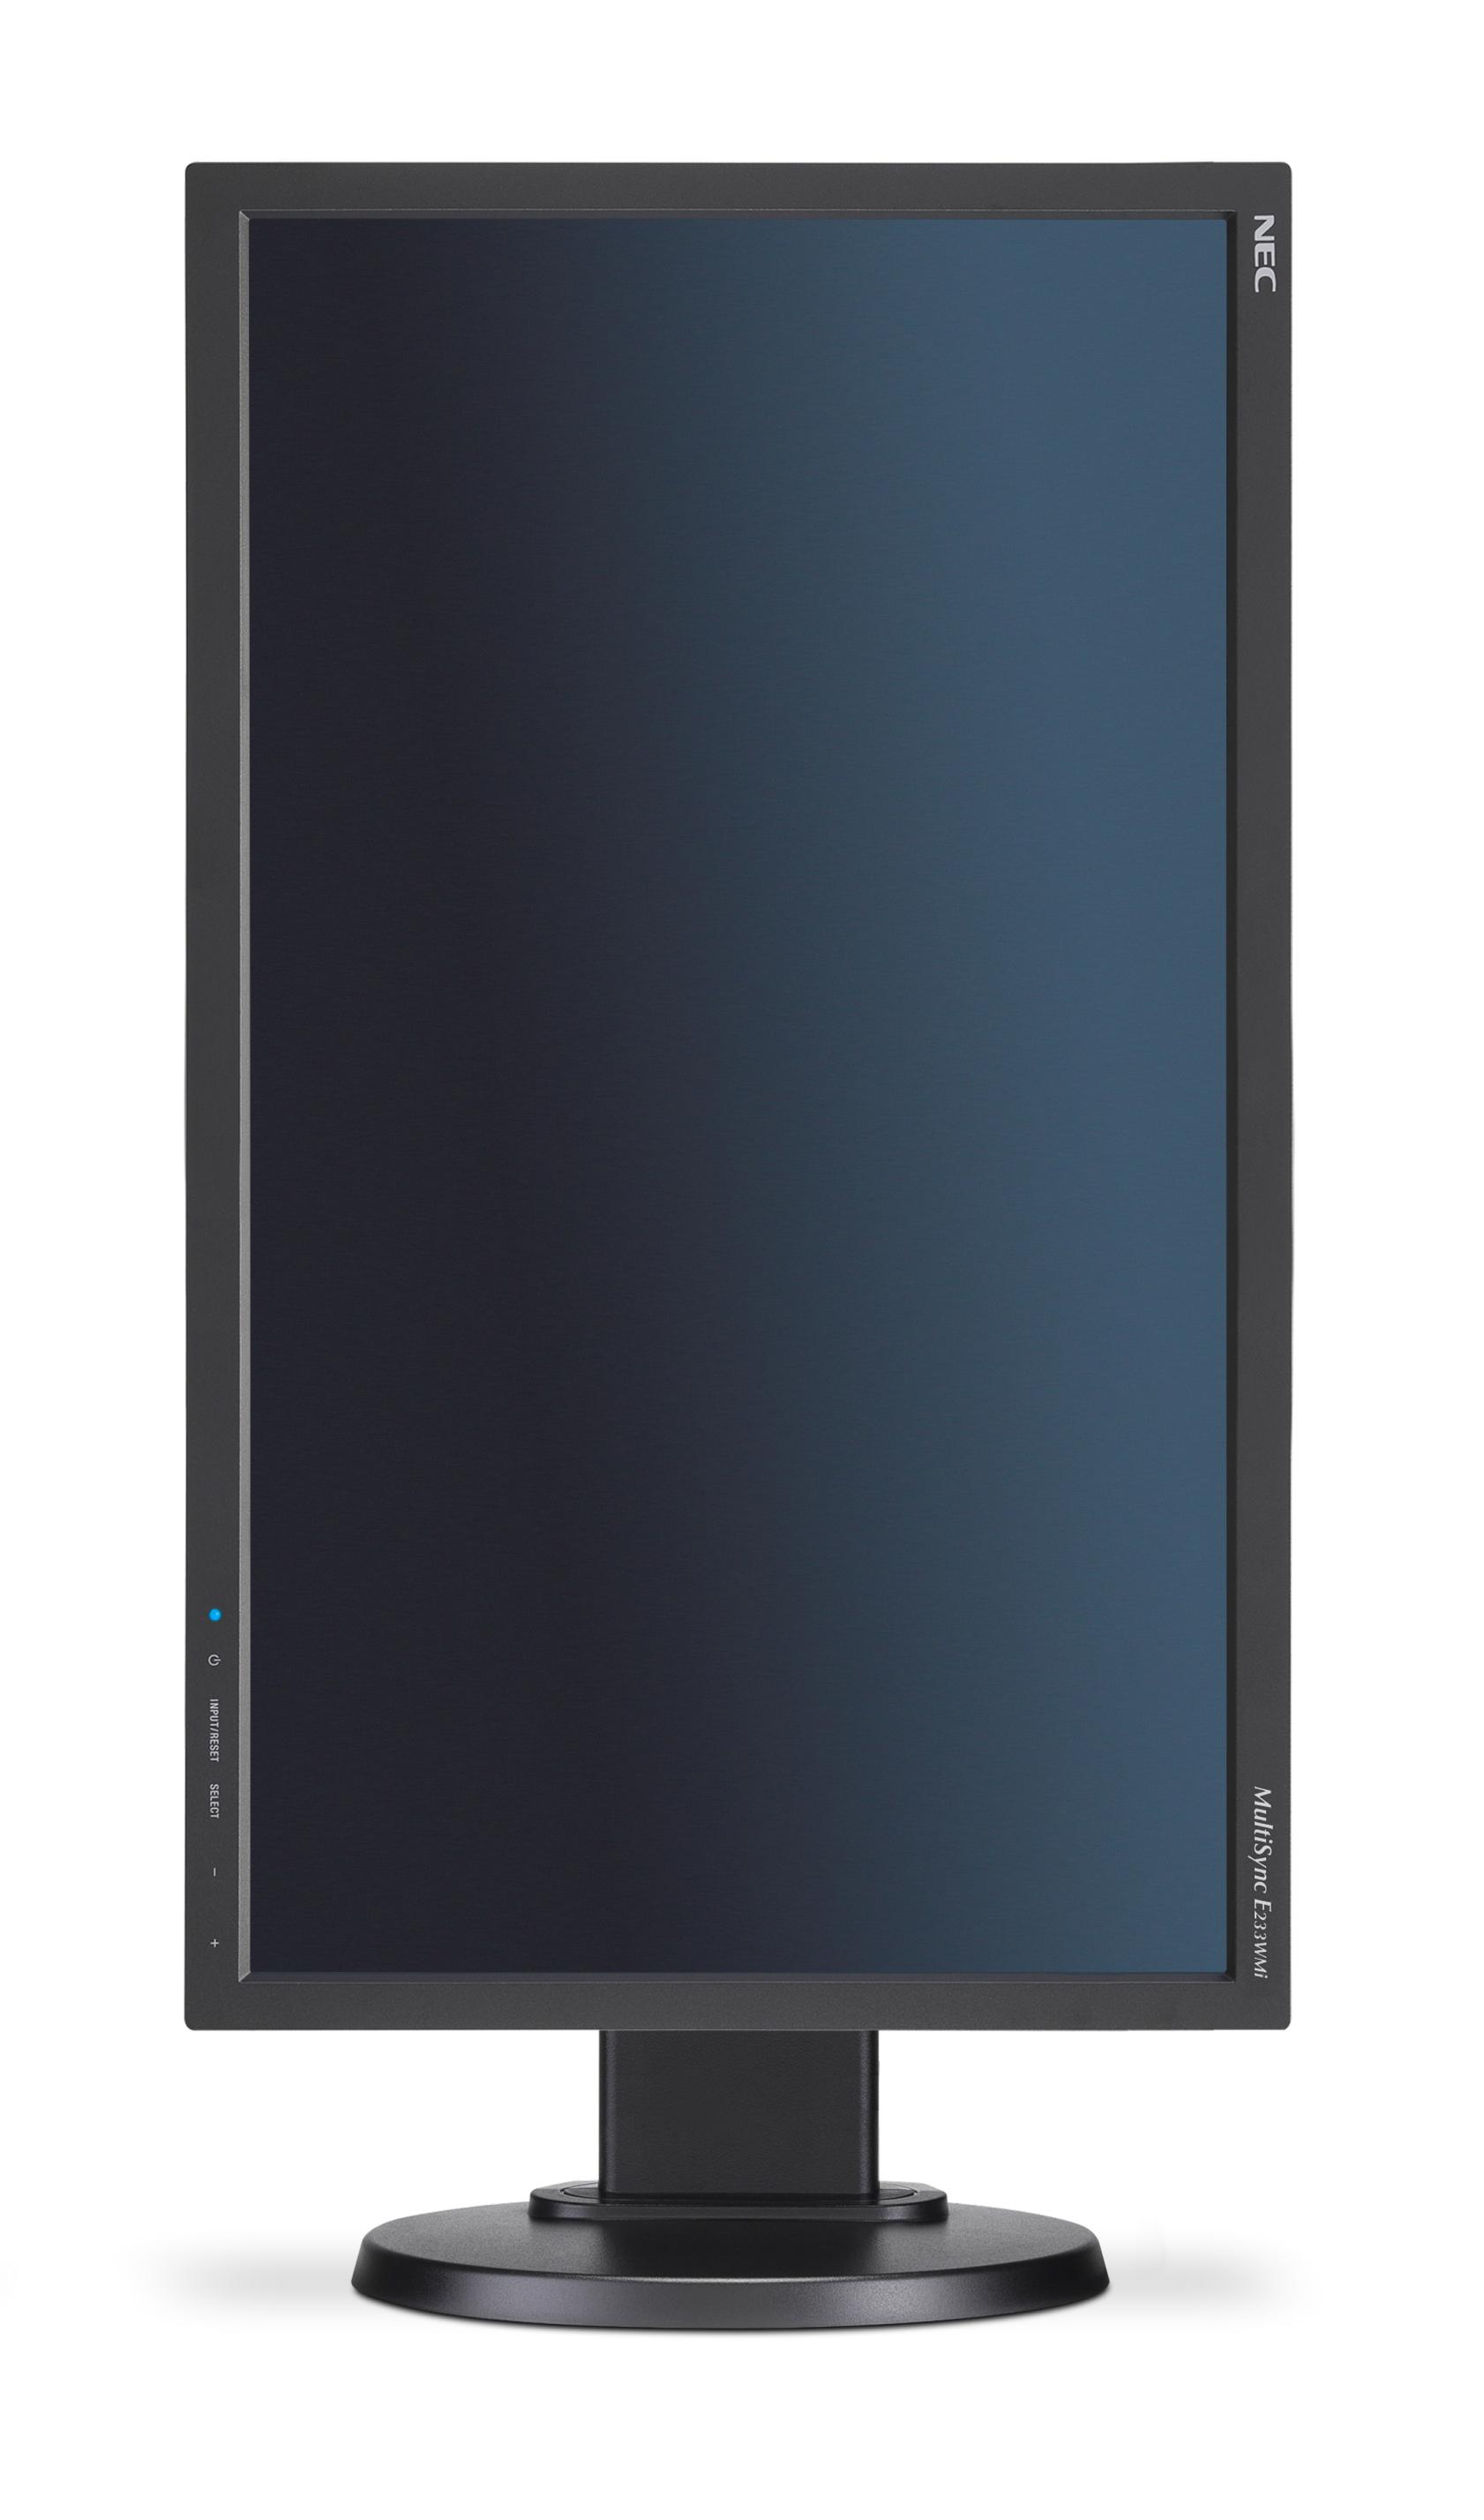 "MultiSync E233WMi LED 23"", 1920 x 1080 Full HD, IPS, 1000:1, 6 ms, DVI-D, VGA, DisplayPort, speakers, zwart"